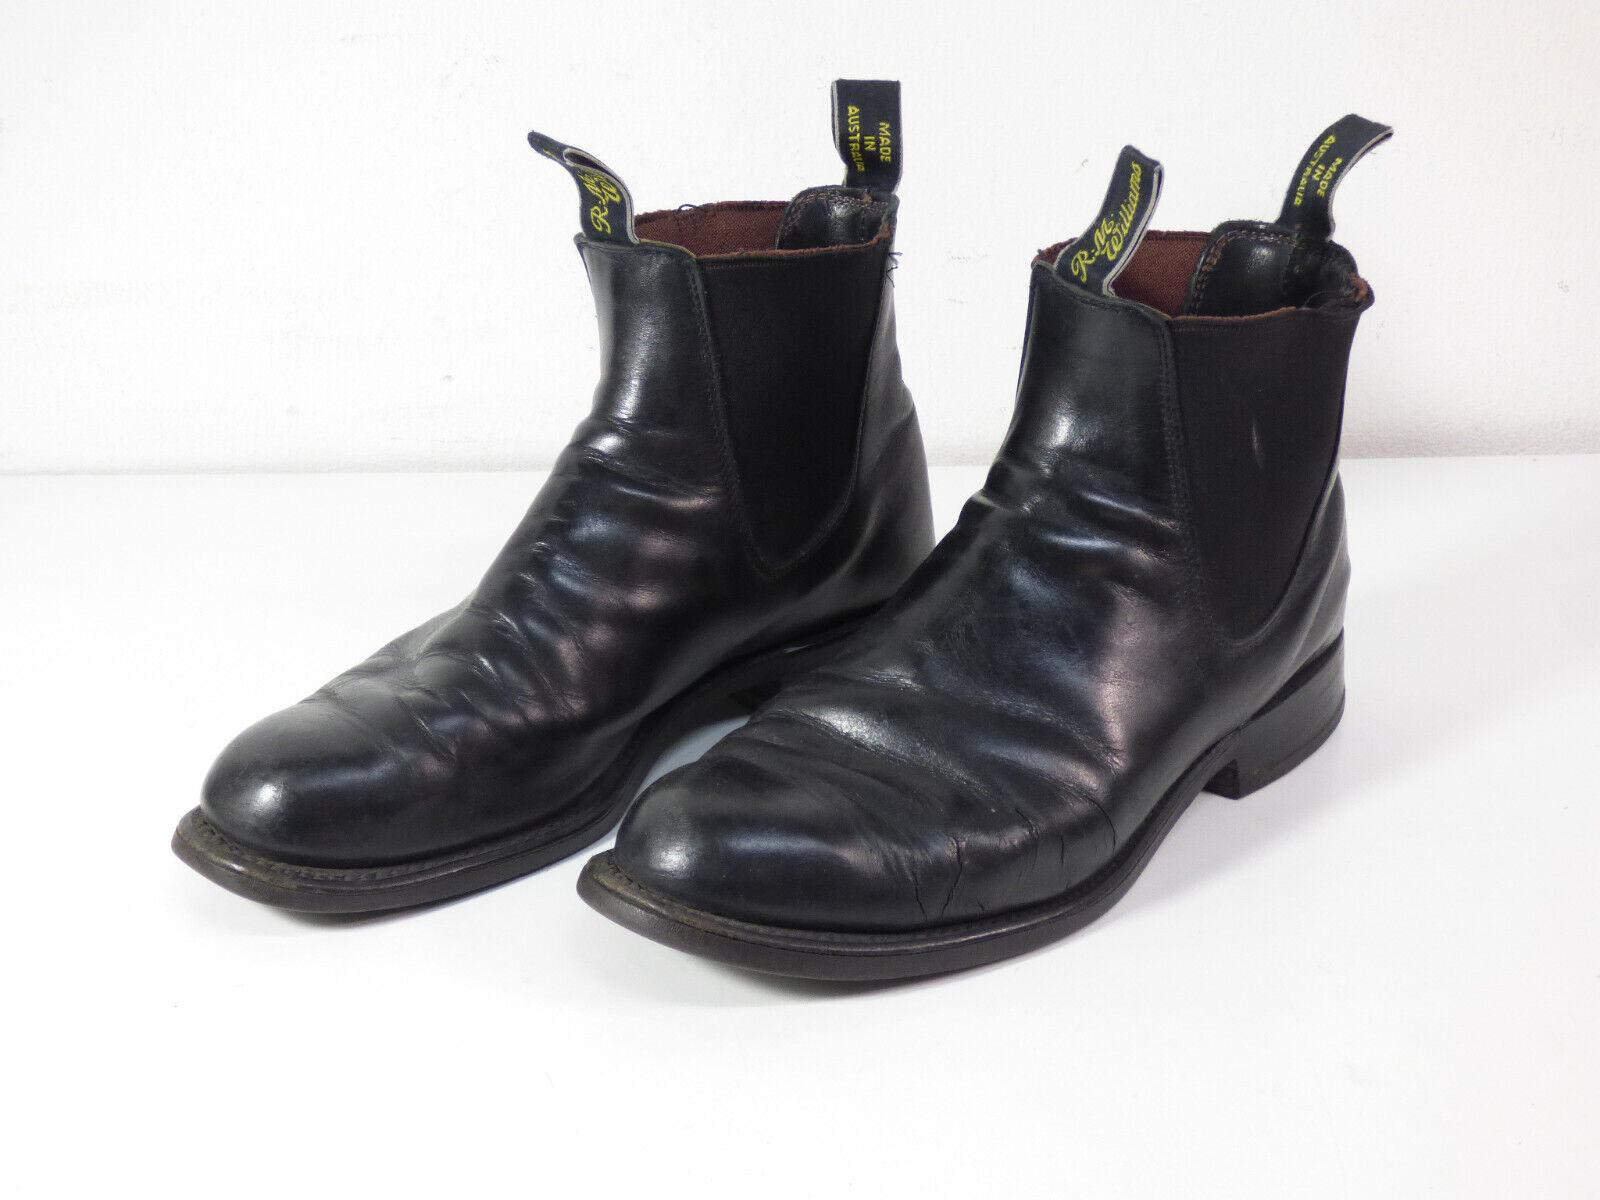 R.M. WILLIAMS Herren Leder Schuhe Stiefel Gr 42 DE   Schwarz Leder ( Q 7513 )